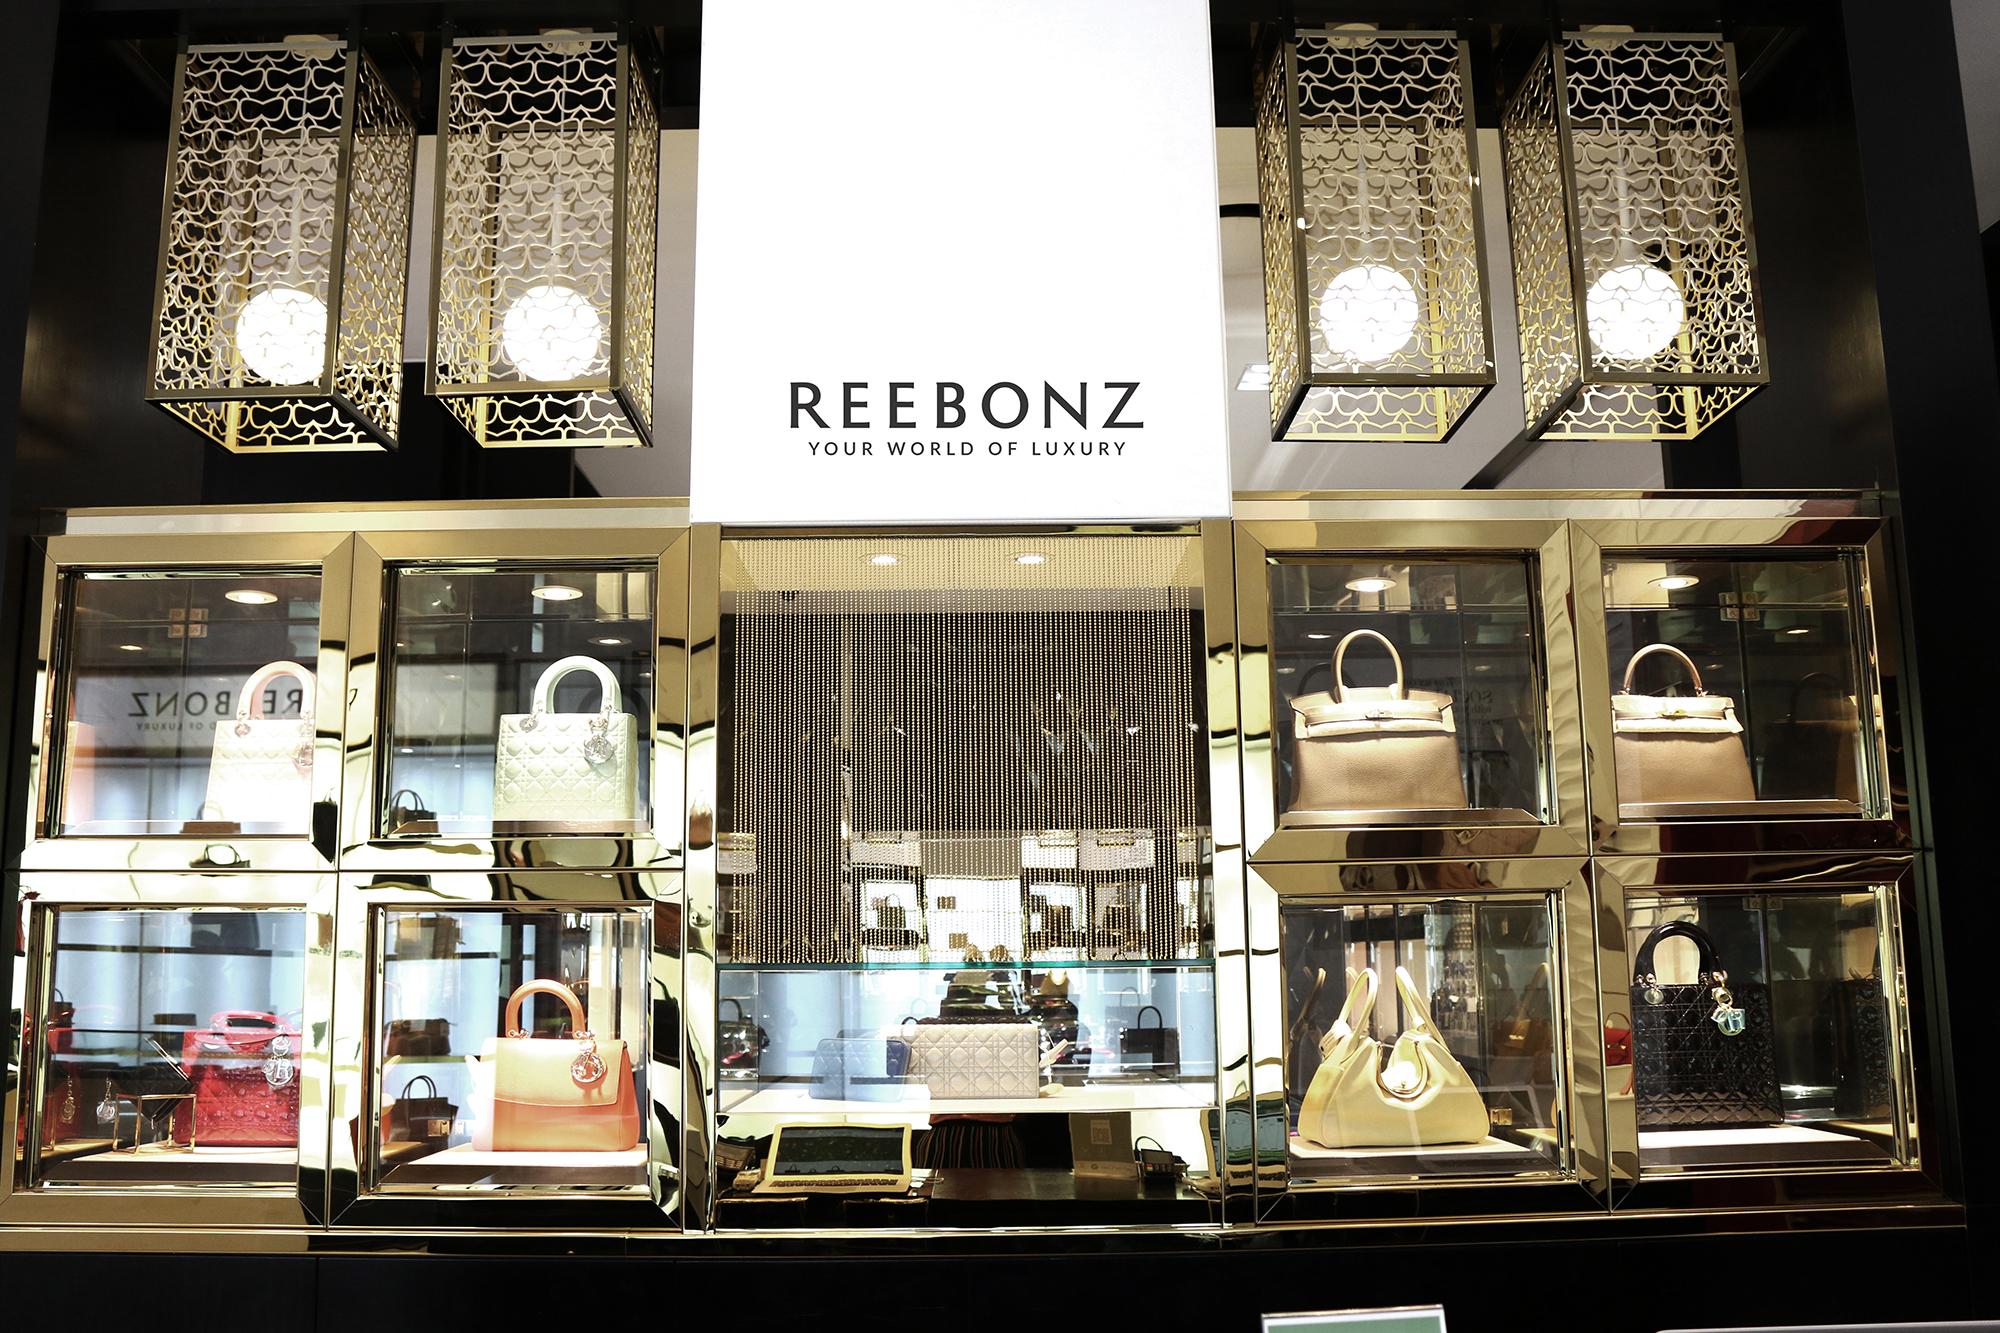 reebonz store designer discounted, the vault online